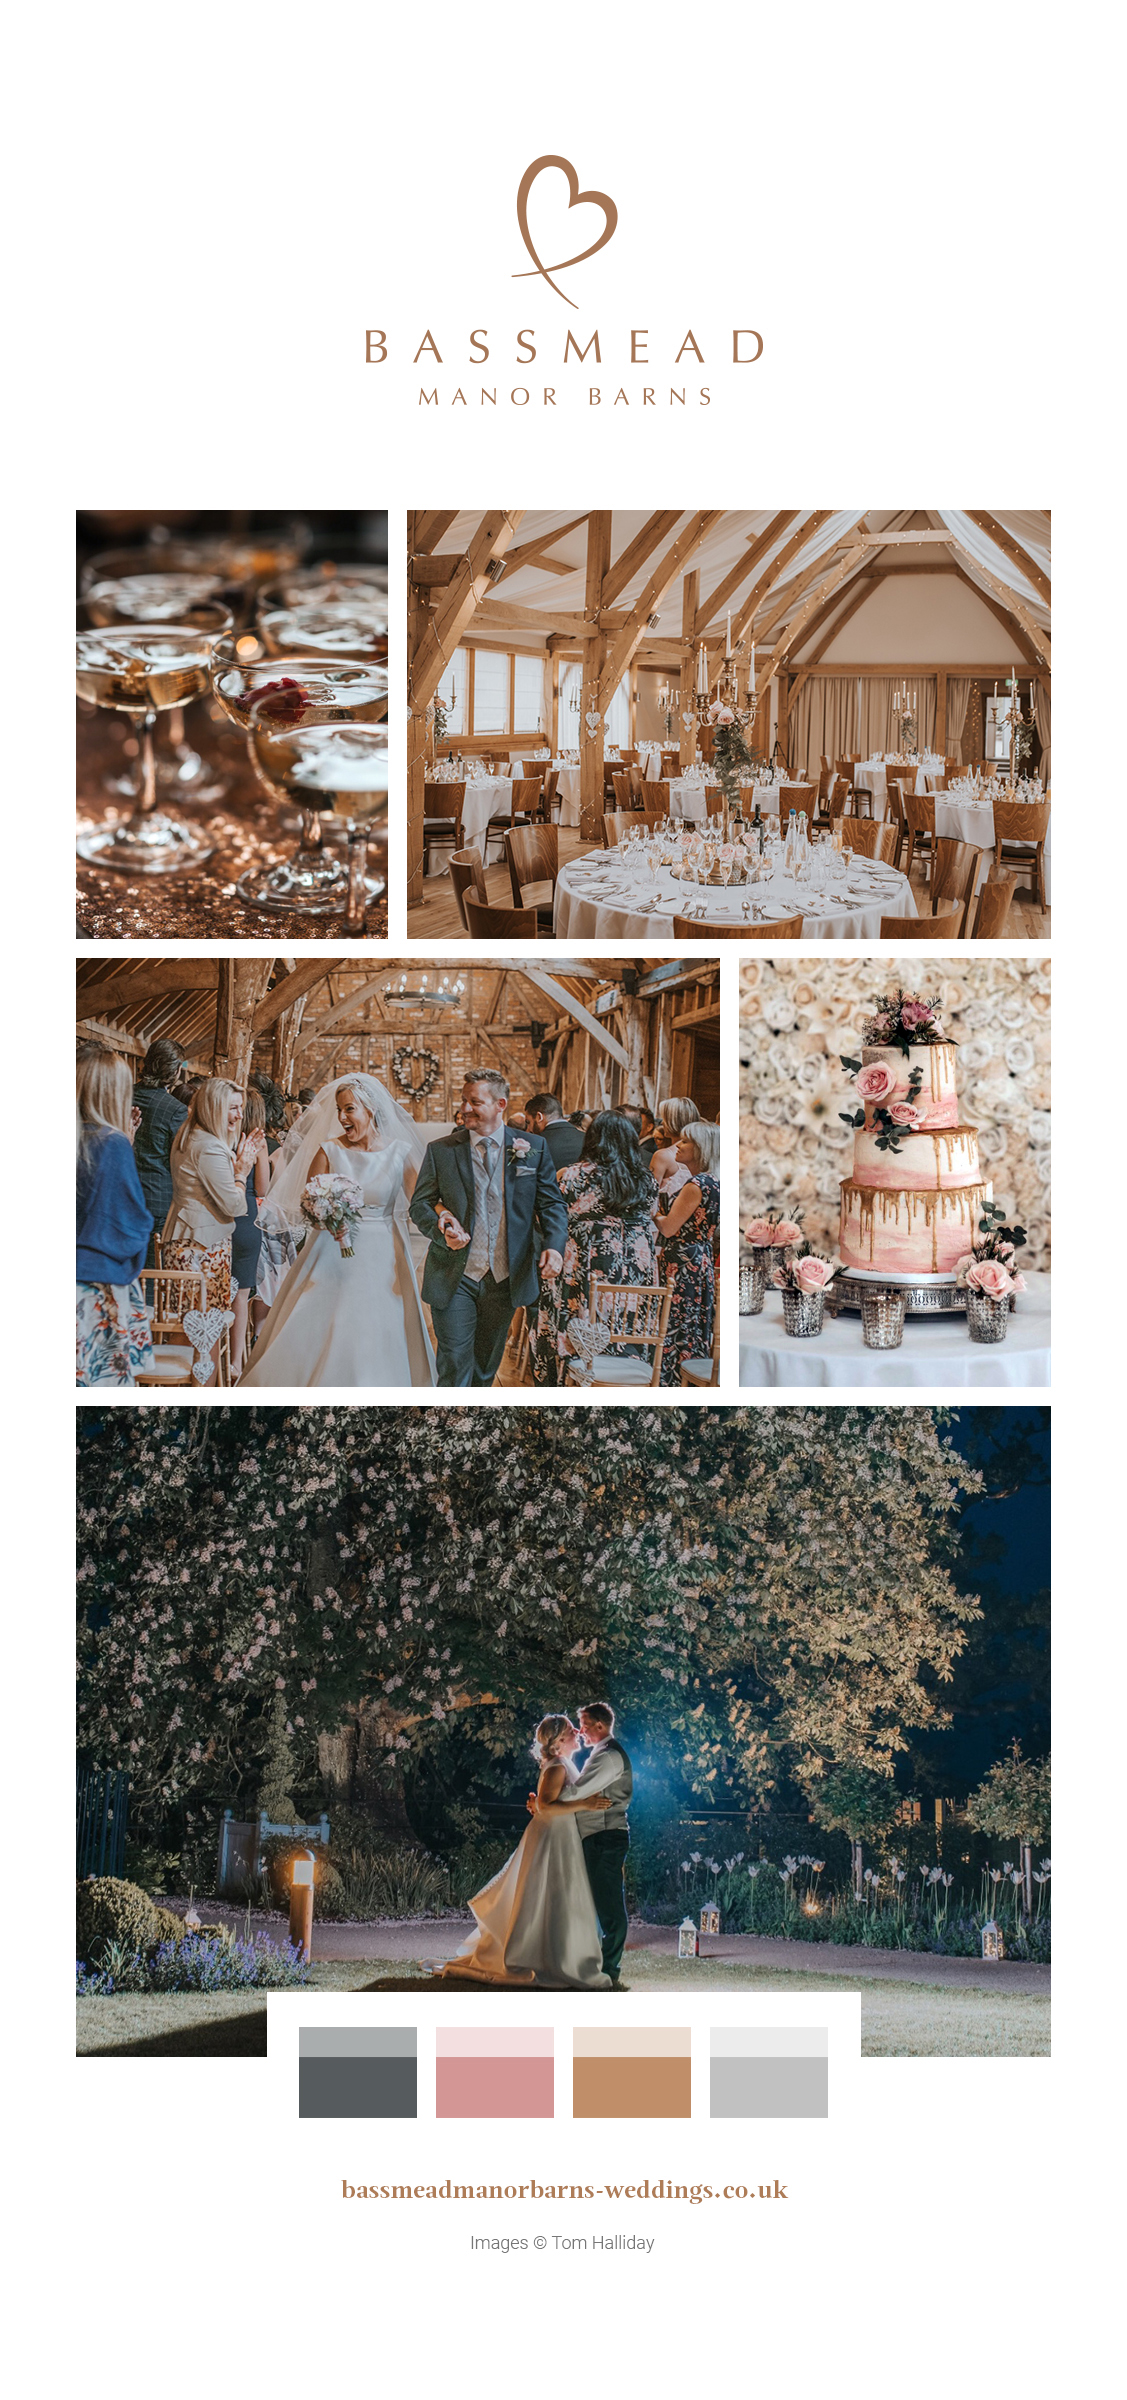 A Glamorous Springtime Celebration – Bassmead Manor Barns